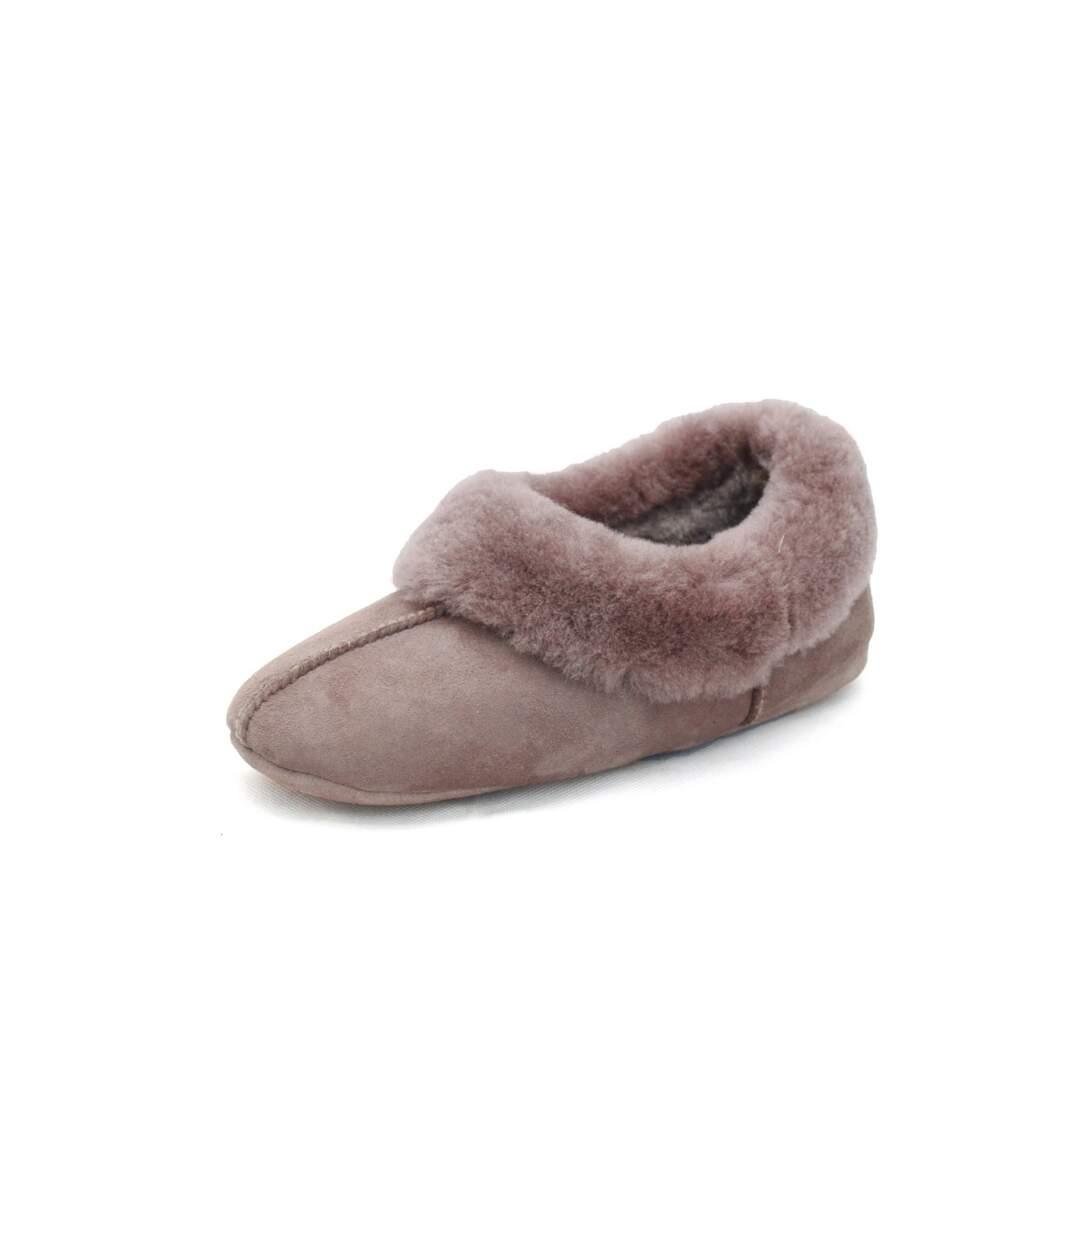 Grande Vente Eastern Counties Leather Chaussons En Peau De Mouton Femme Mink UTEL159 dsf.d455nksdKLFHG